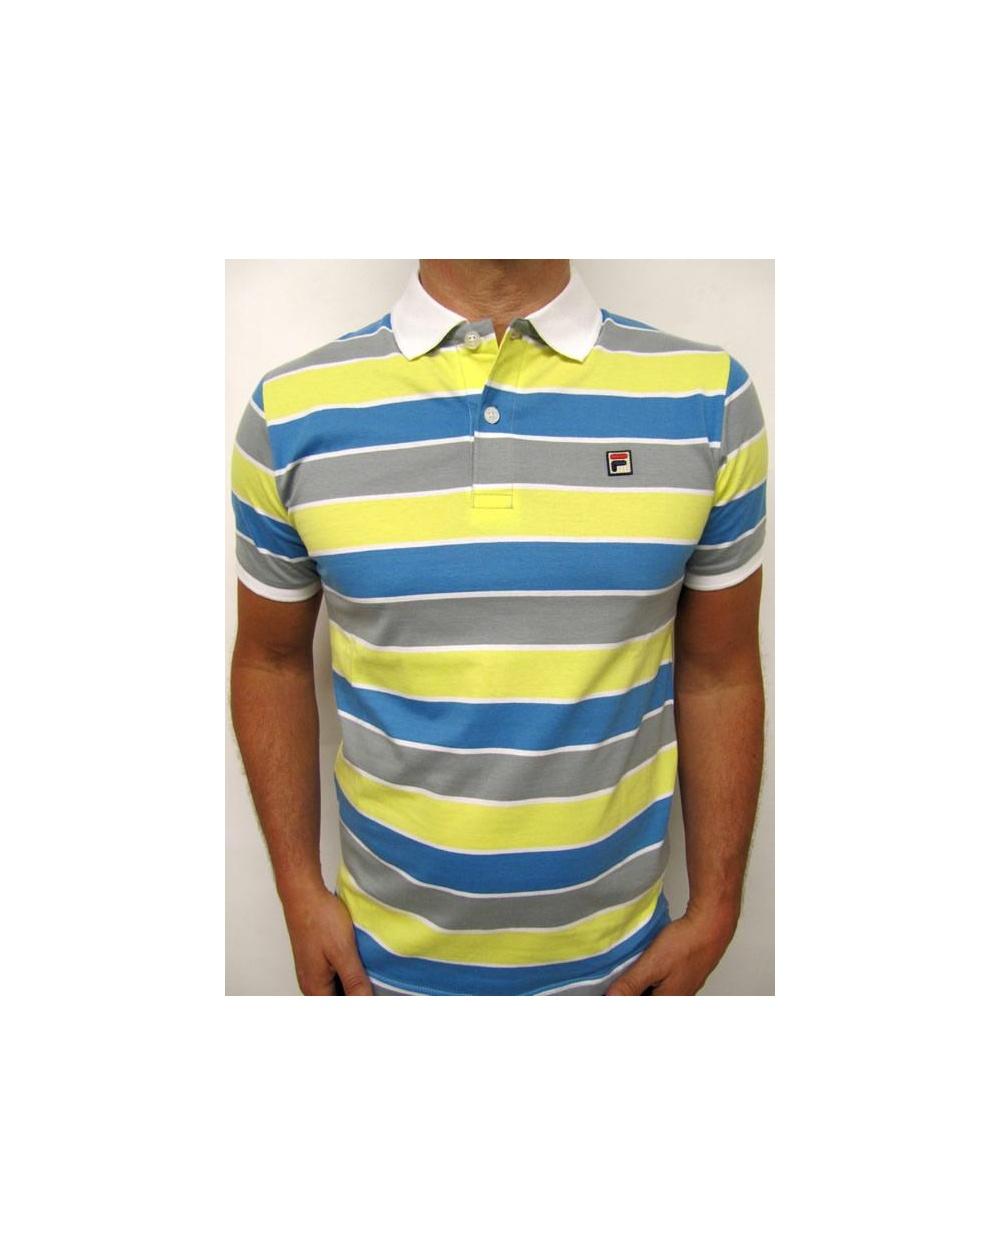 9d7c5eba1b Fila Vintage Smuggler Striped Polo Yellow/Blue/Grey - fila vintage ...